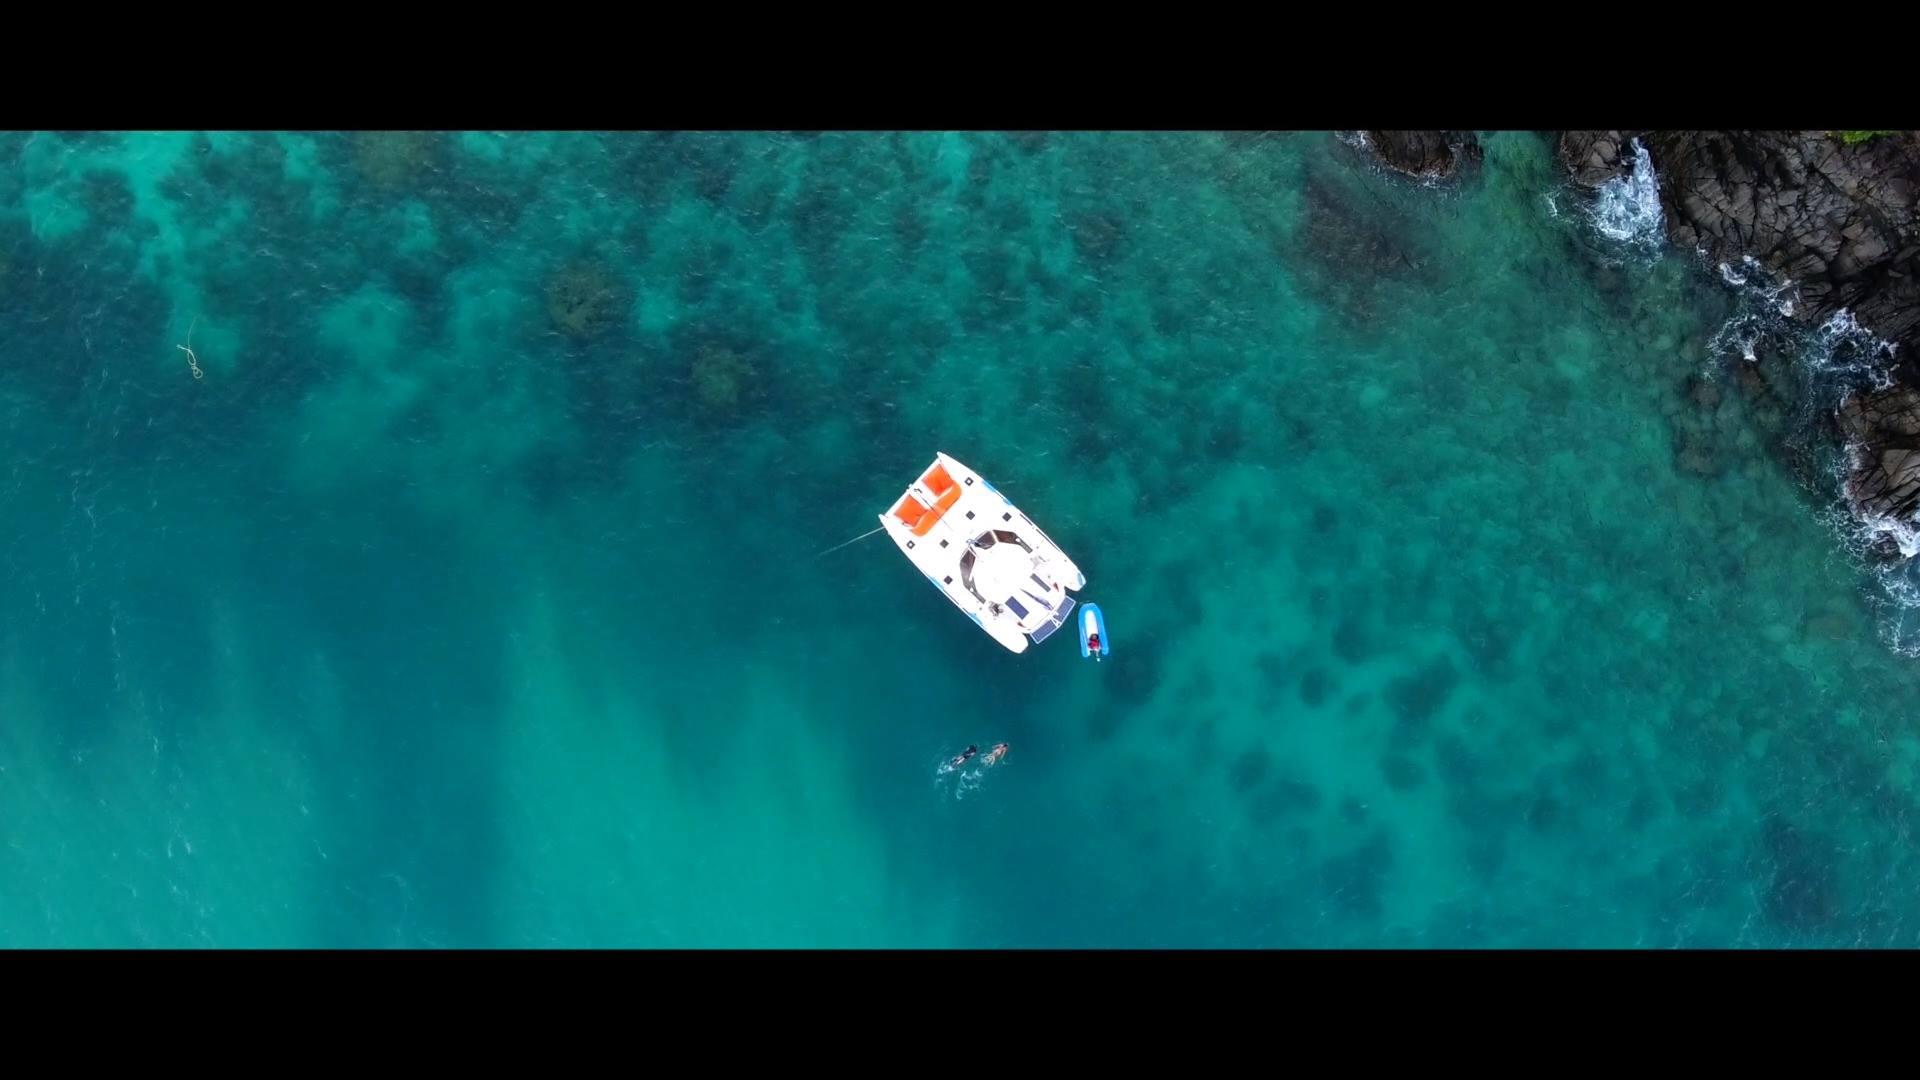 Catamaran Klook Present